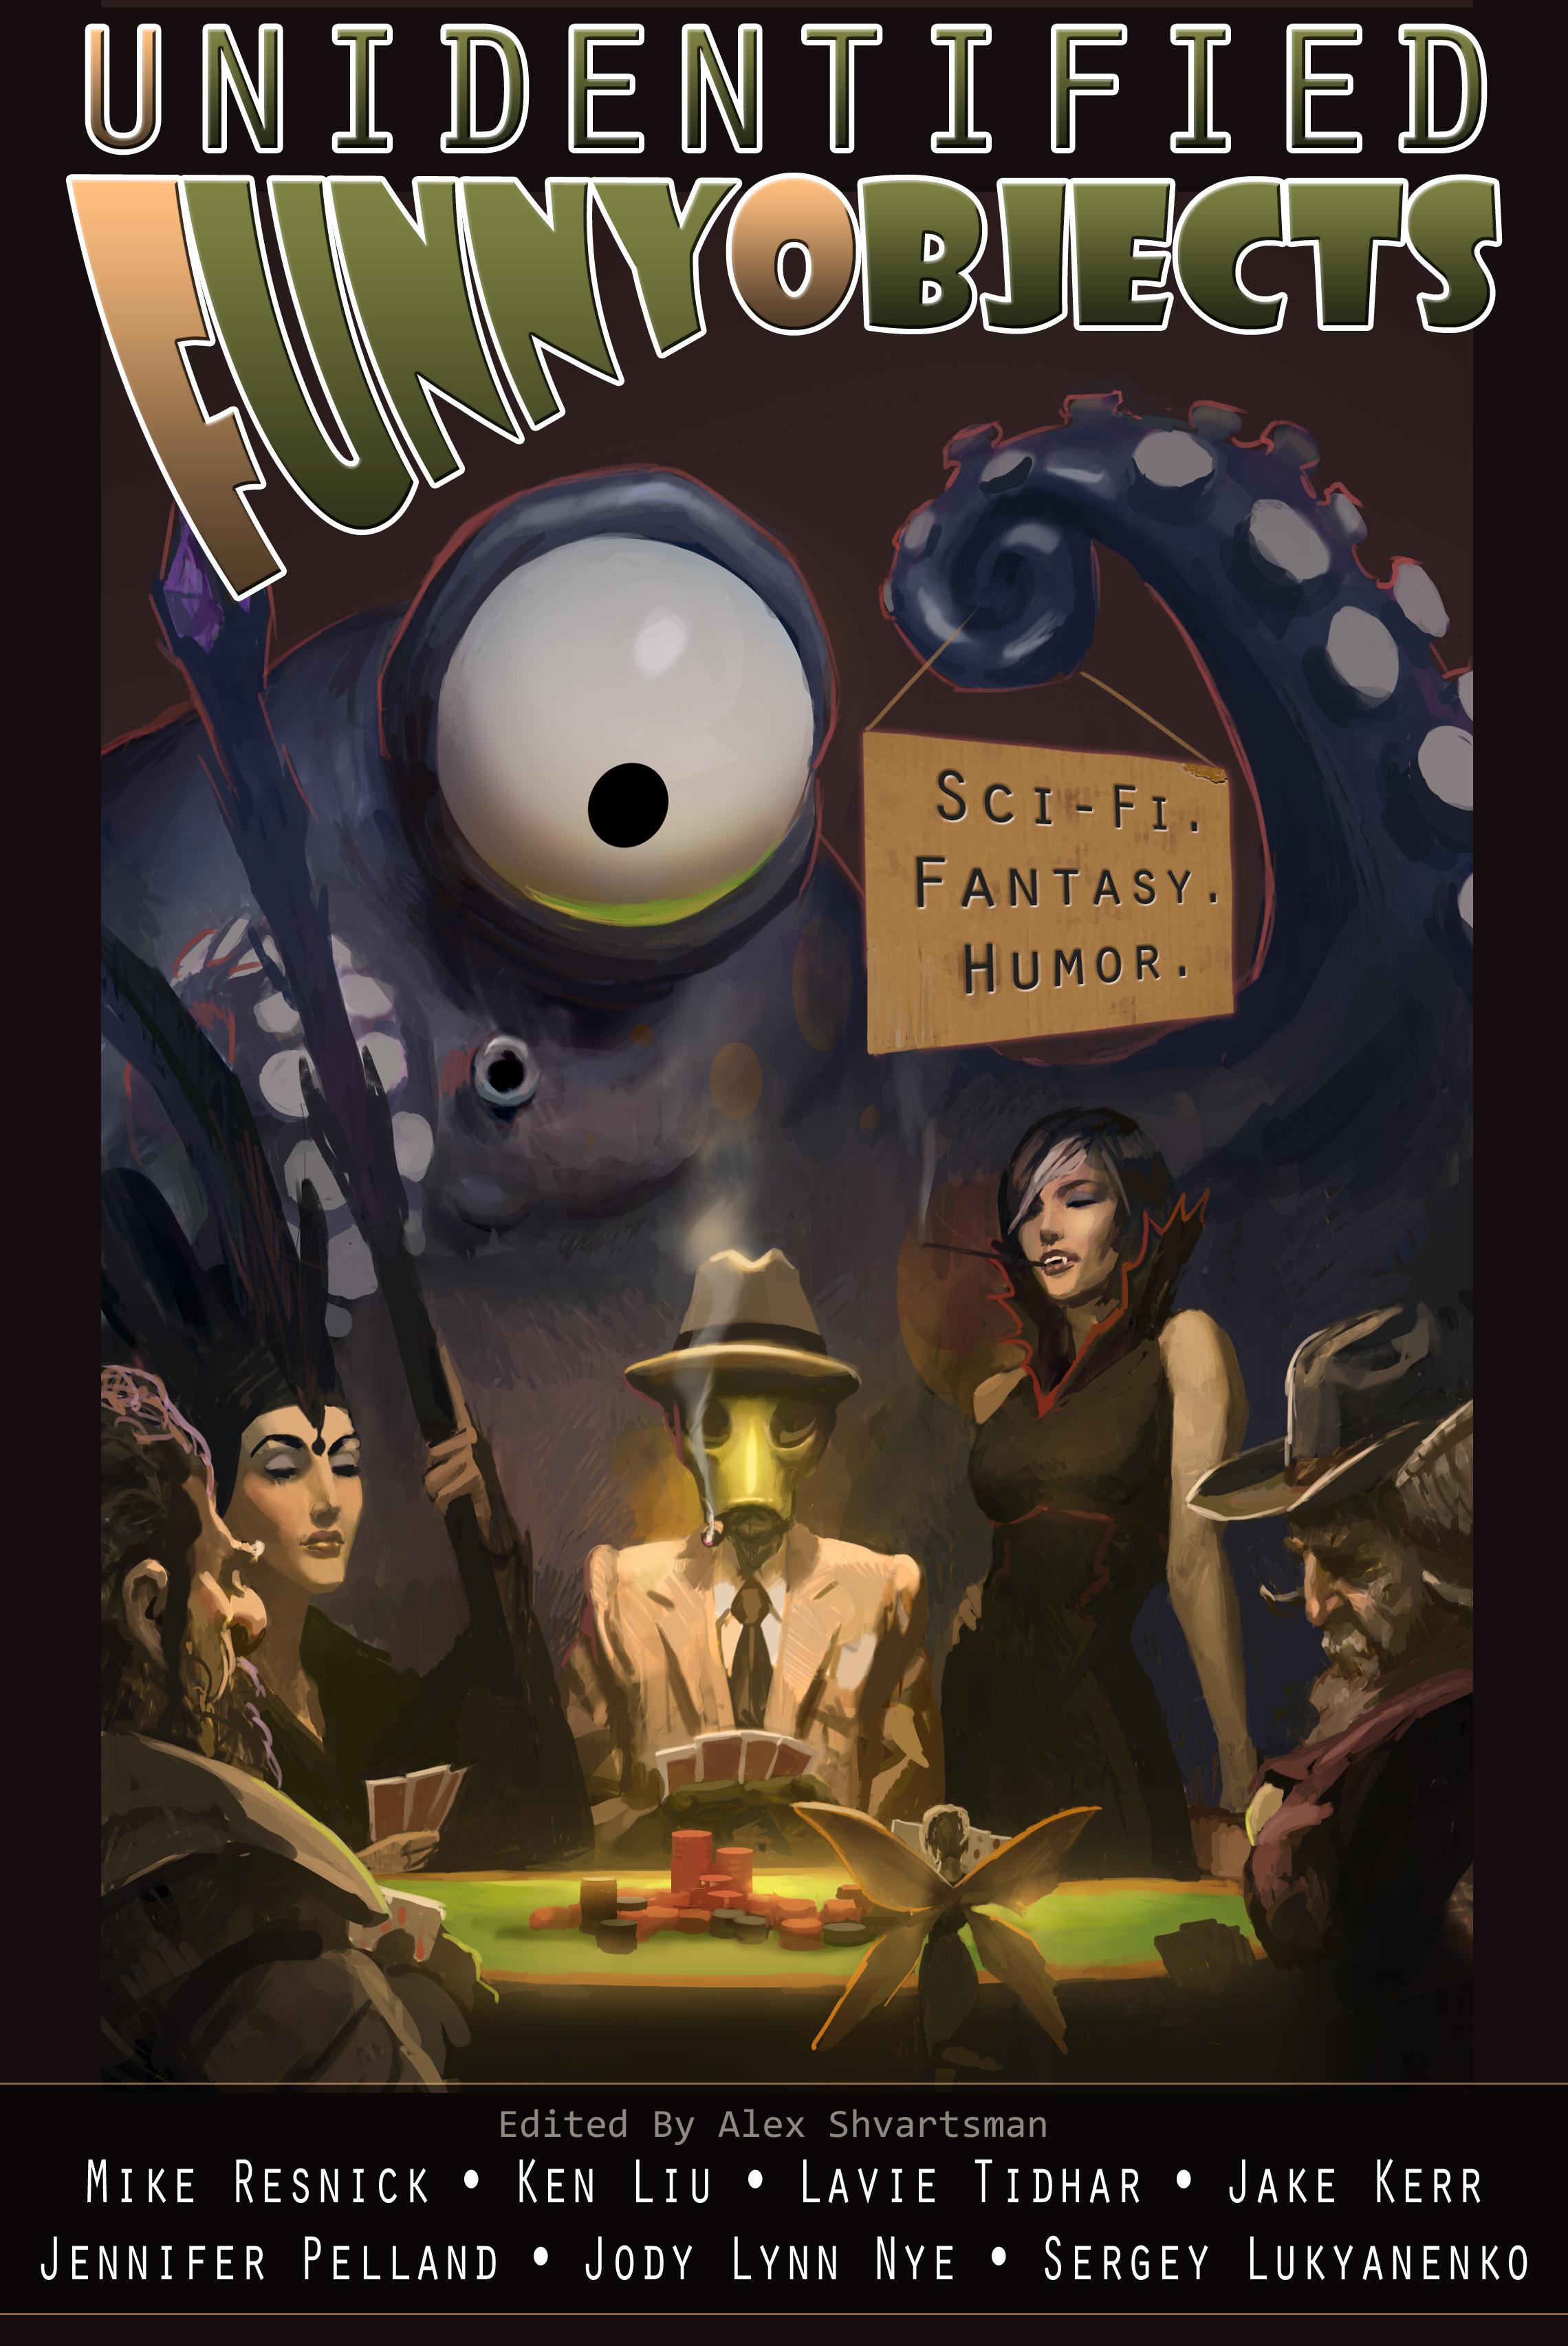 Unidentified Funny Objects Anthology (UFO)